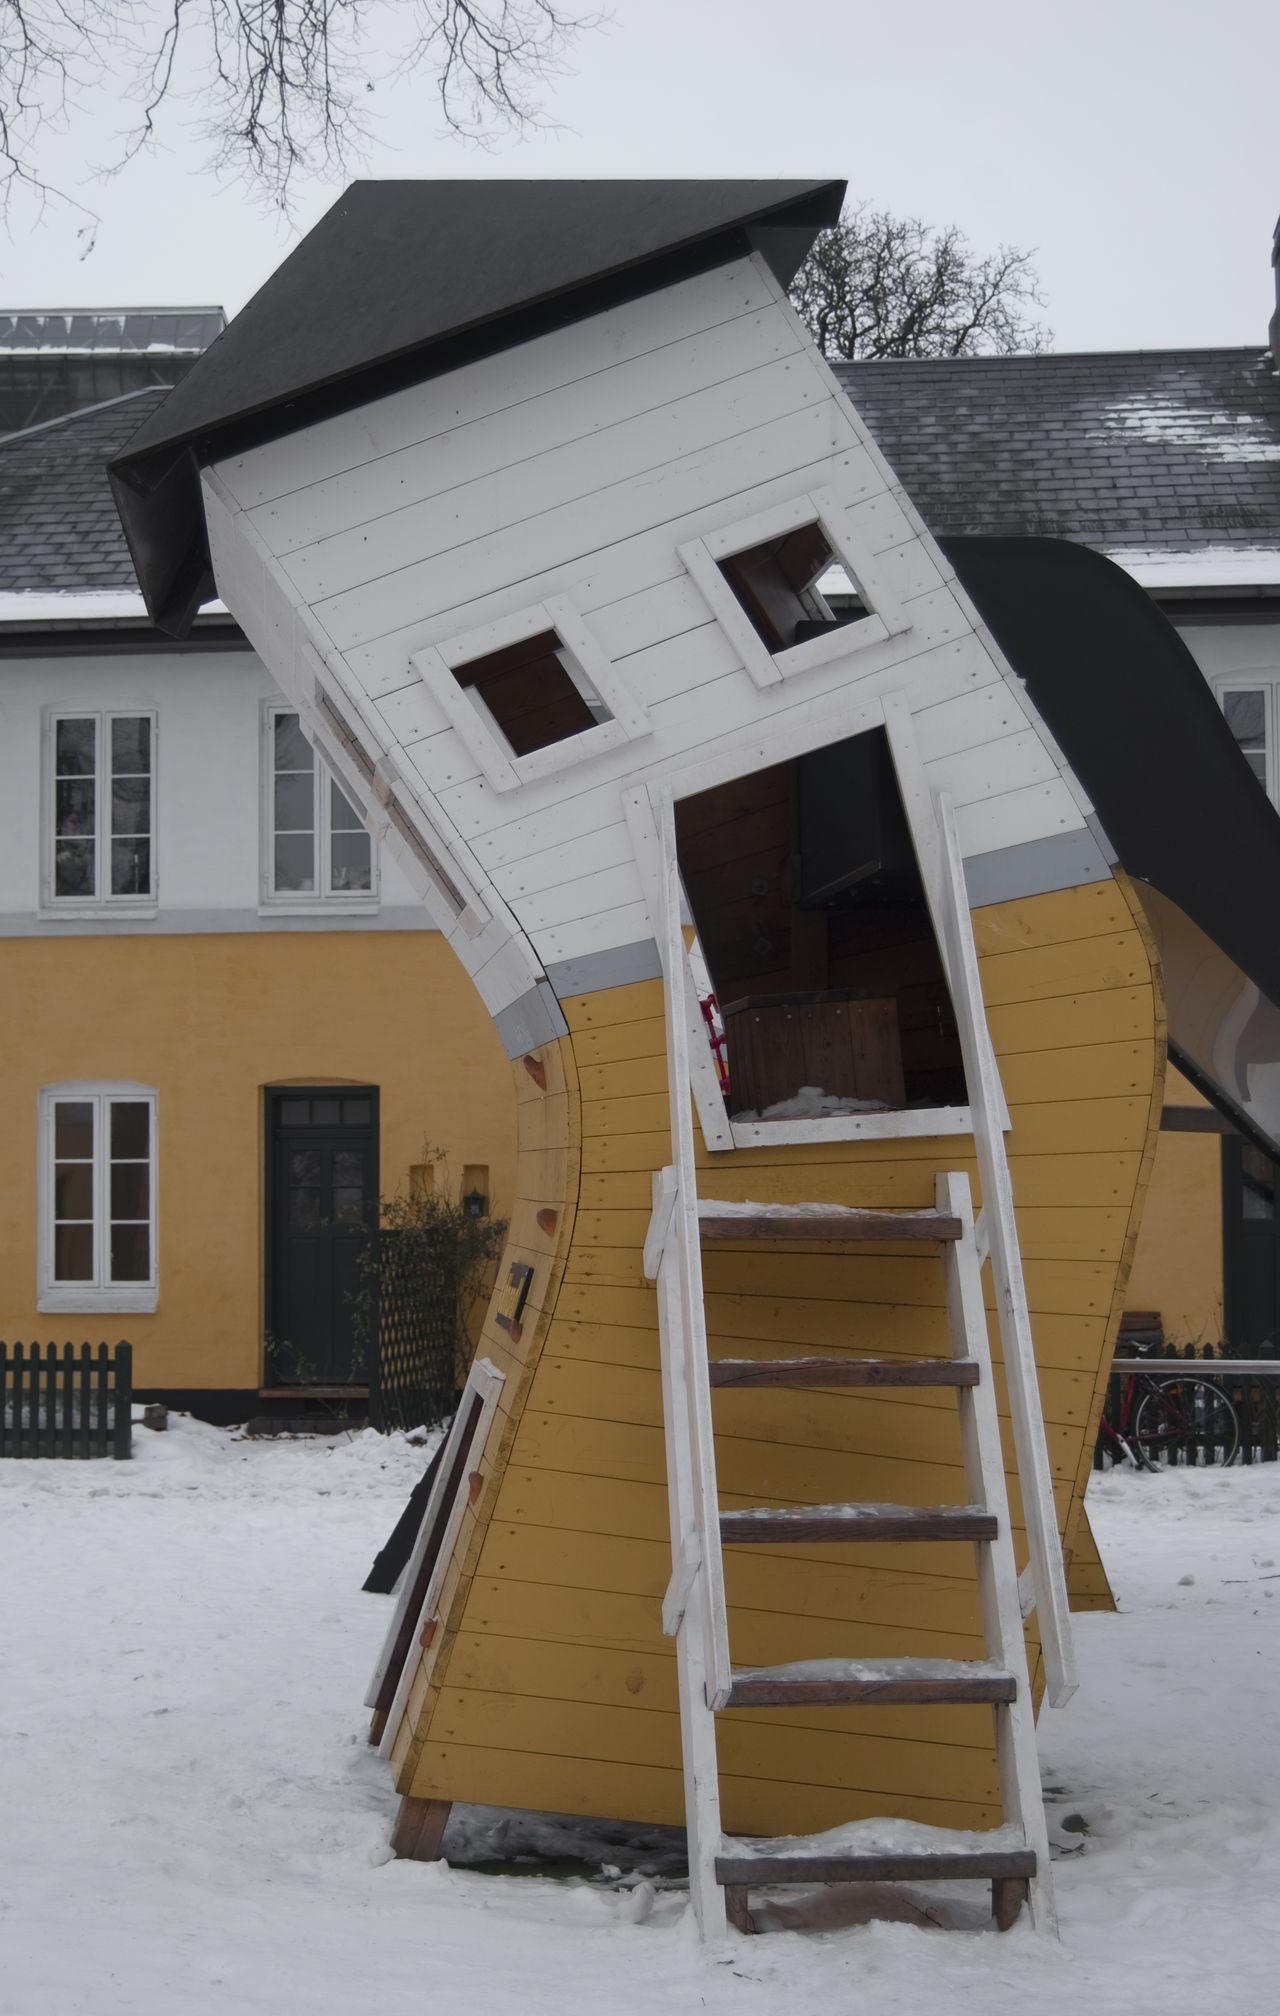 Architecture Building Exterior Built Structure Copenhagen, Denmark Funny Architecture House No People Snow Stair